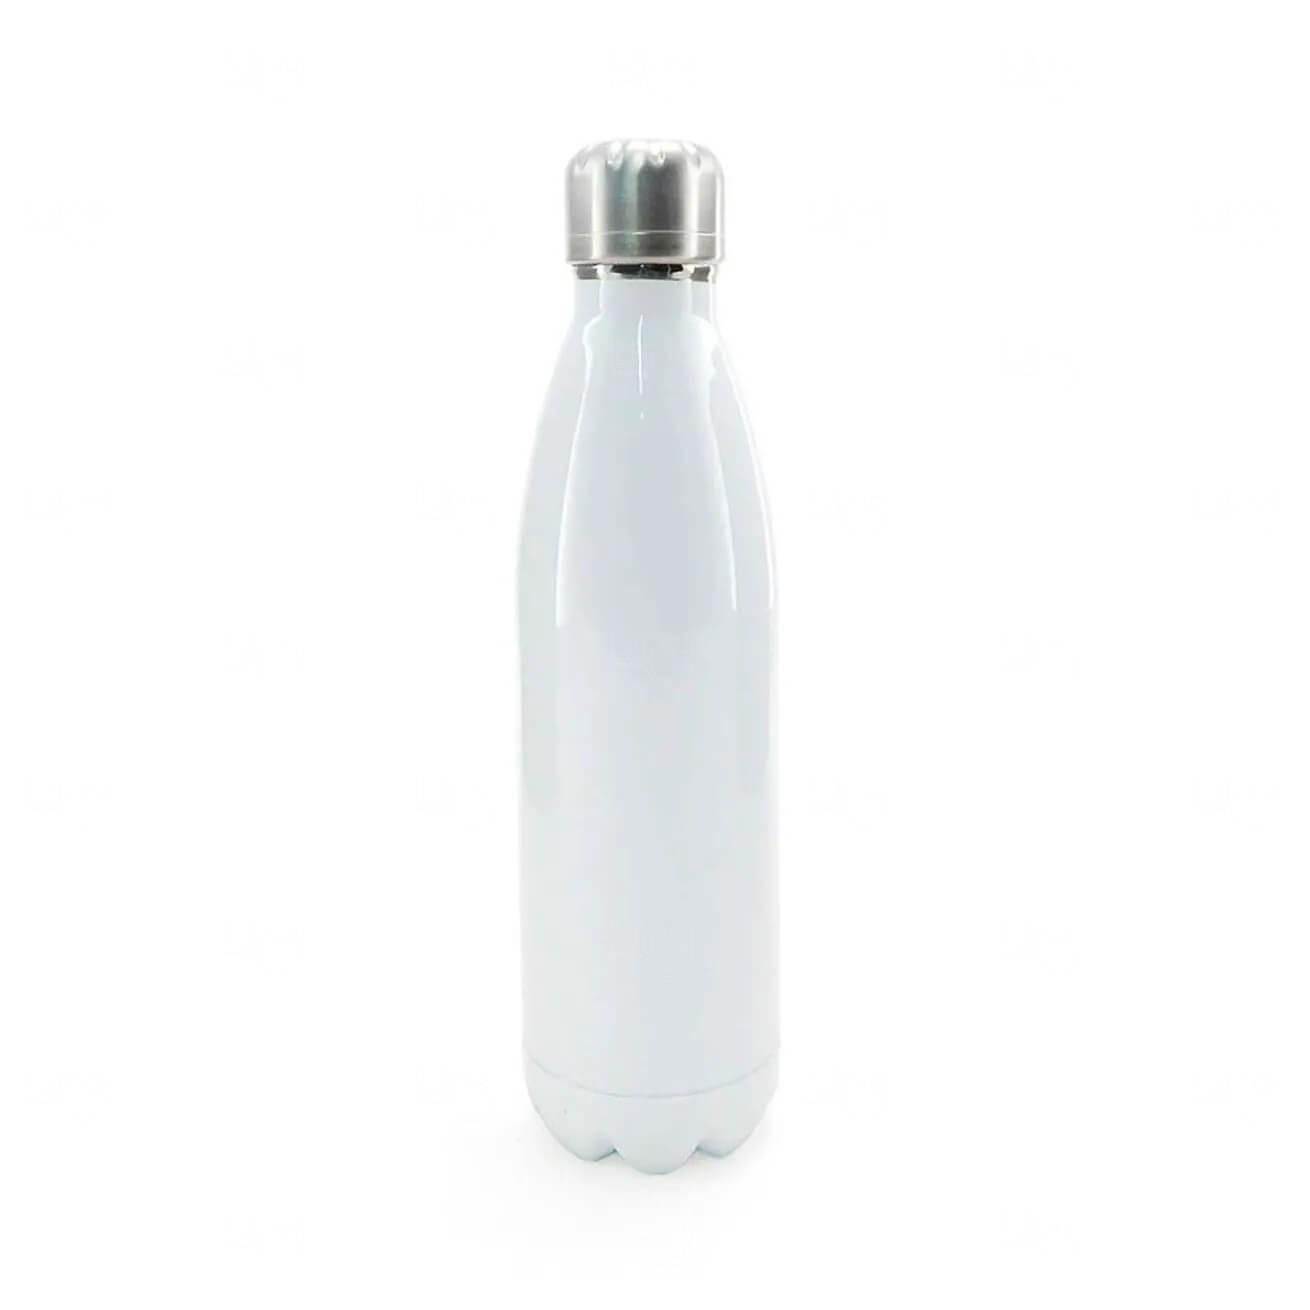 Garrafa Inox Personalizada - 500 ml Branco